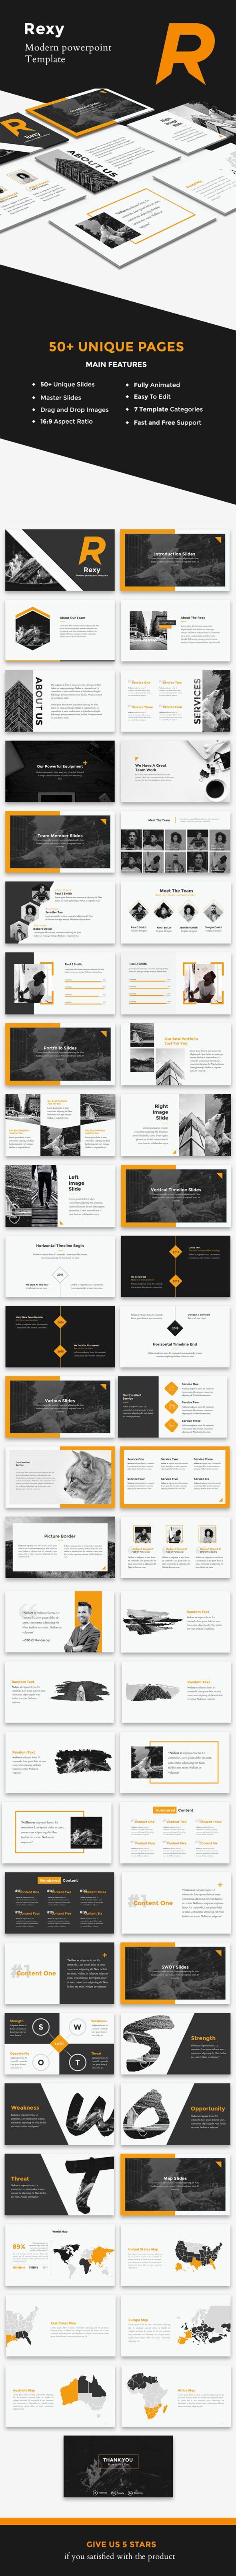 Rexy - Modern PowerPoint Template - Creative PowerPoint Templates